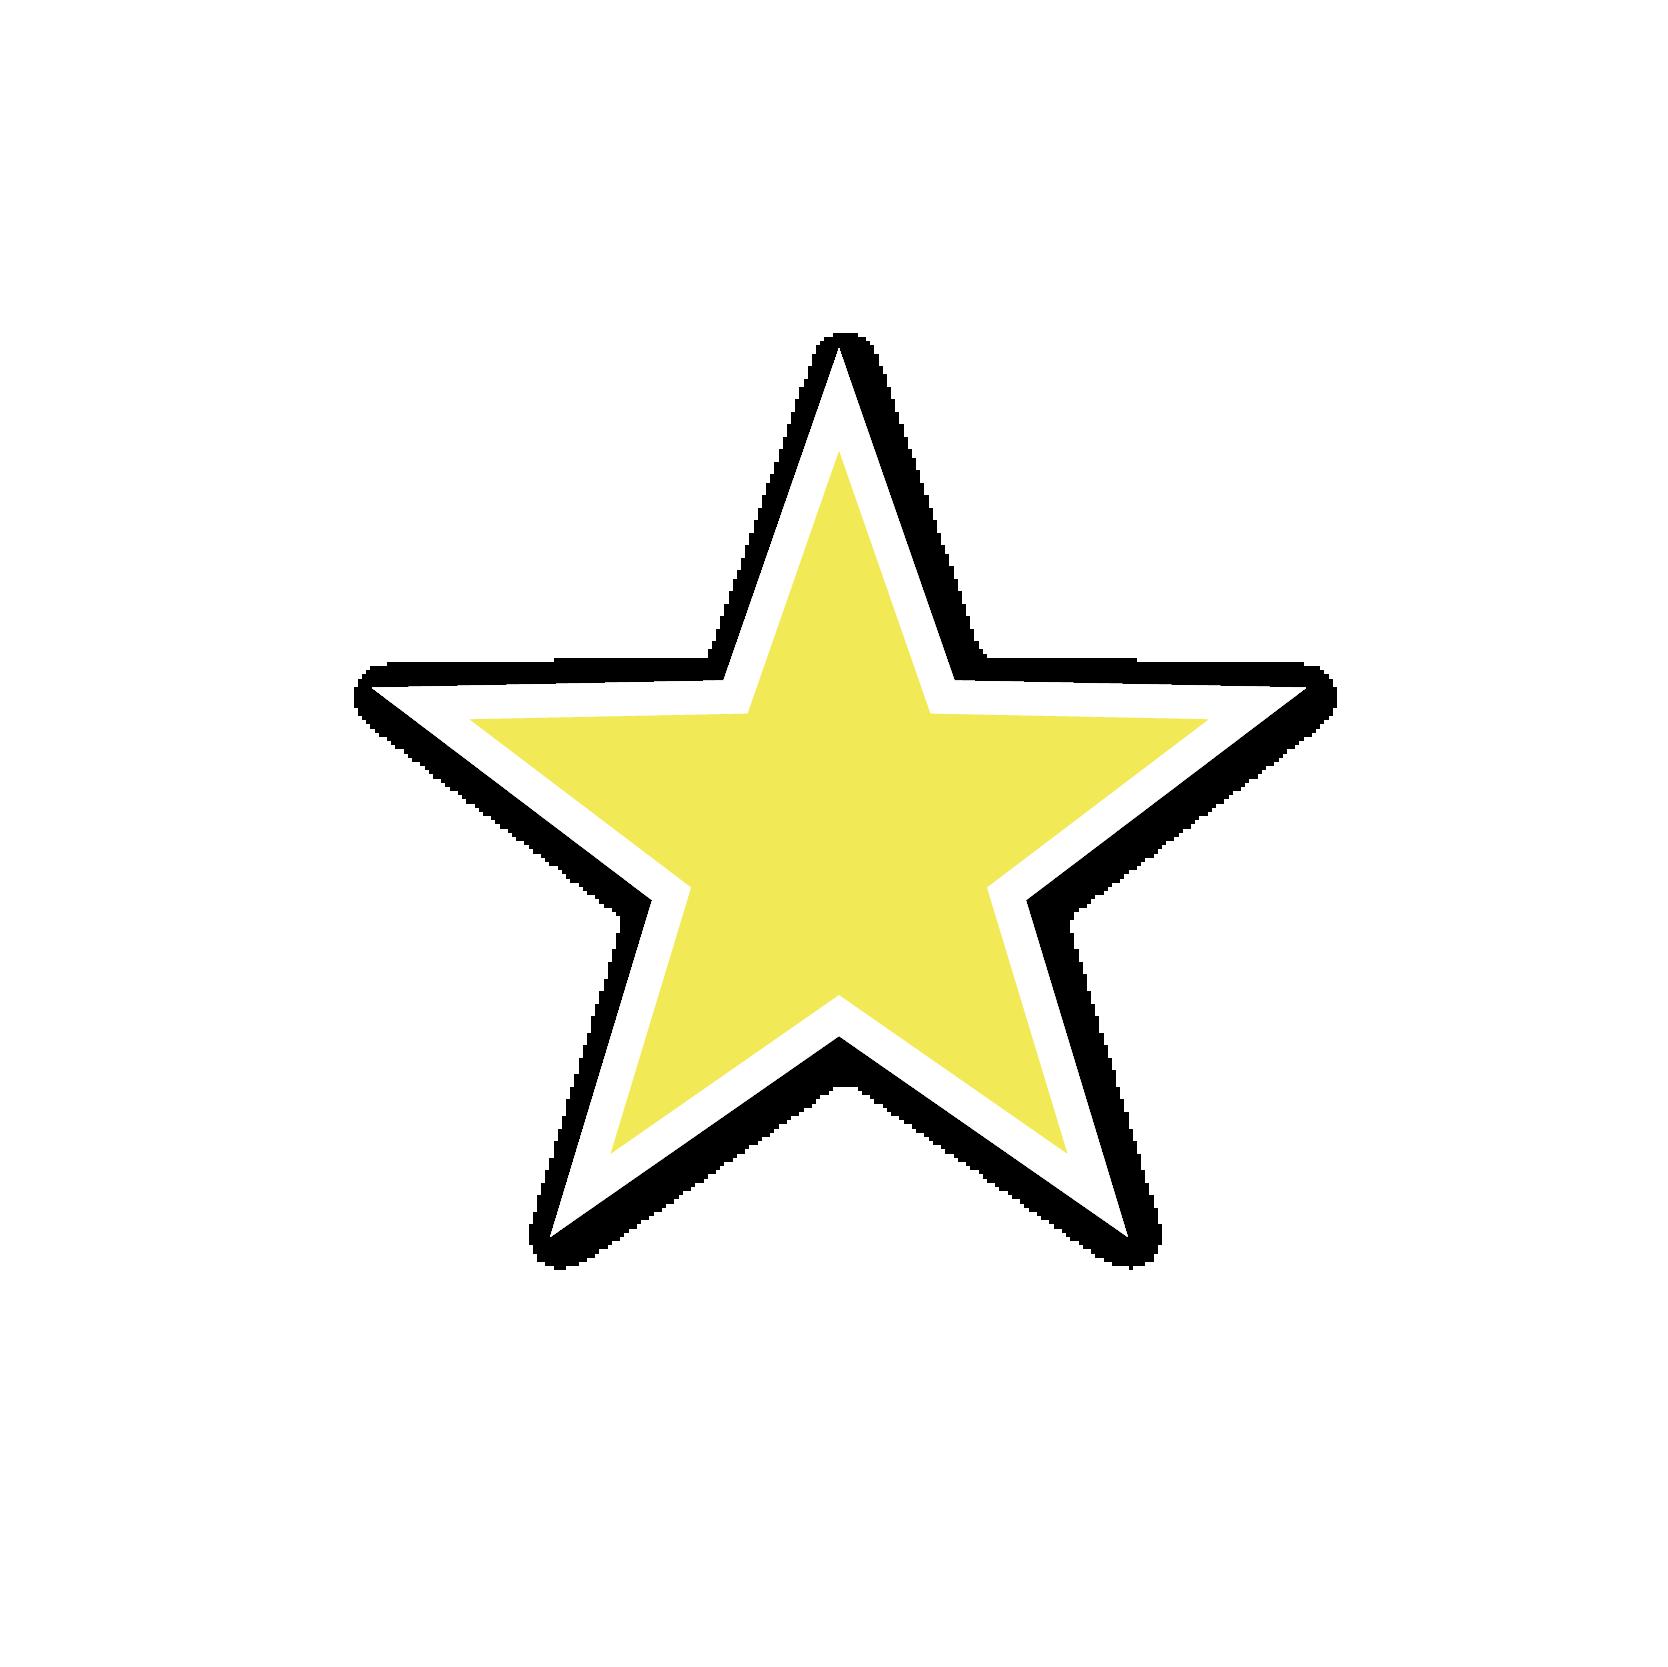 A yellow star sticker